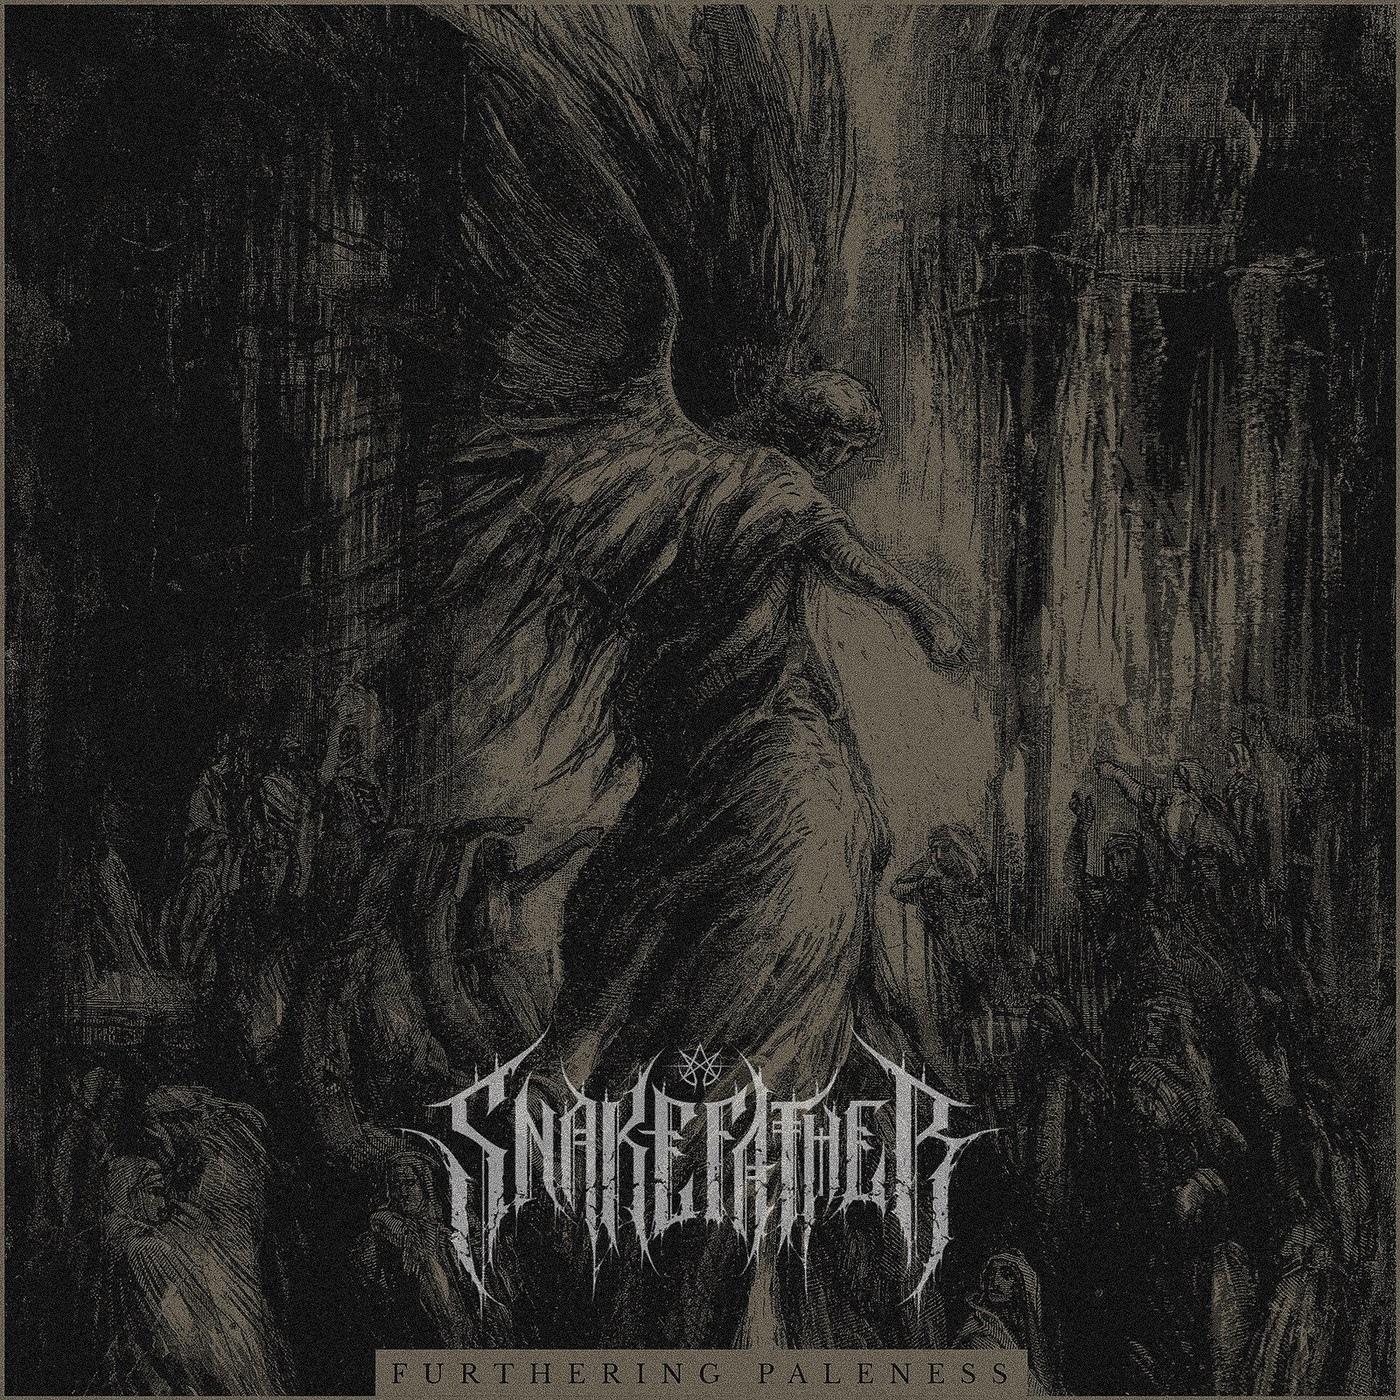 Snake Father - Furthering Paleness [single] (2021)